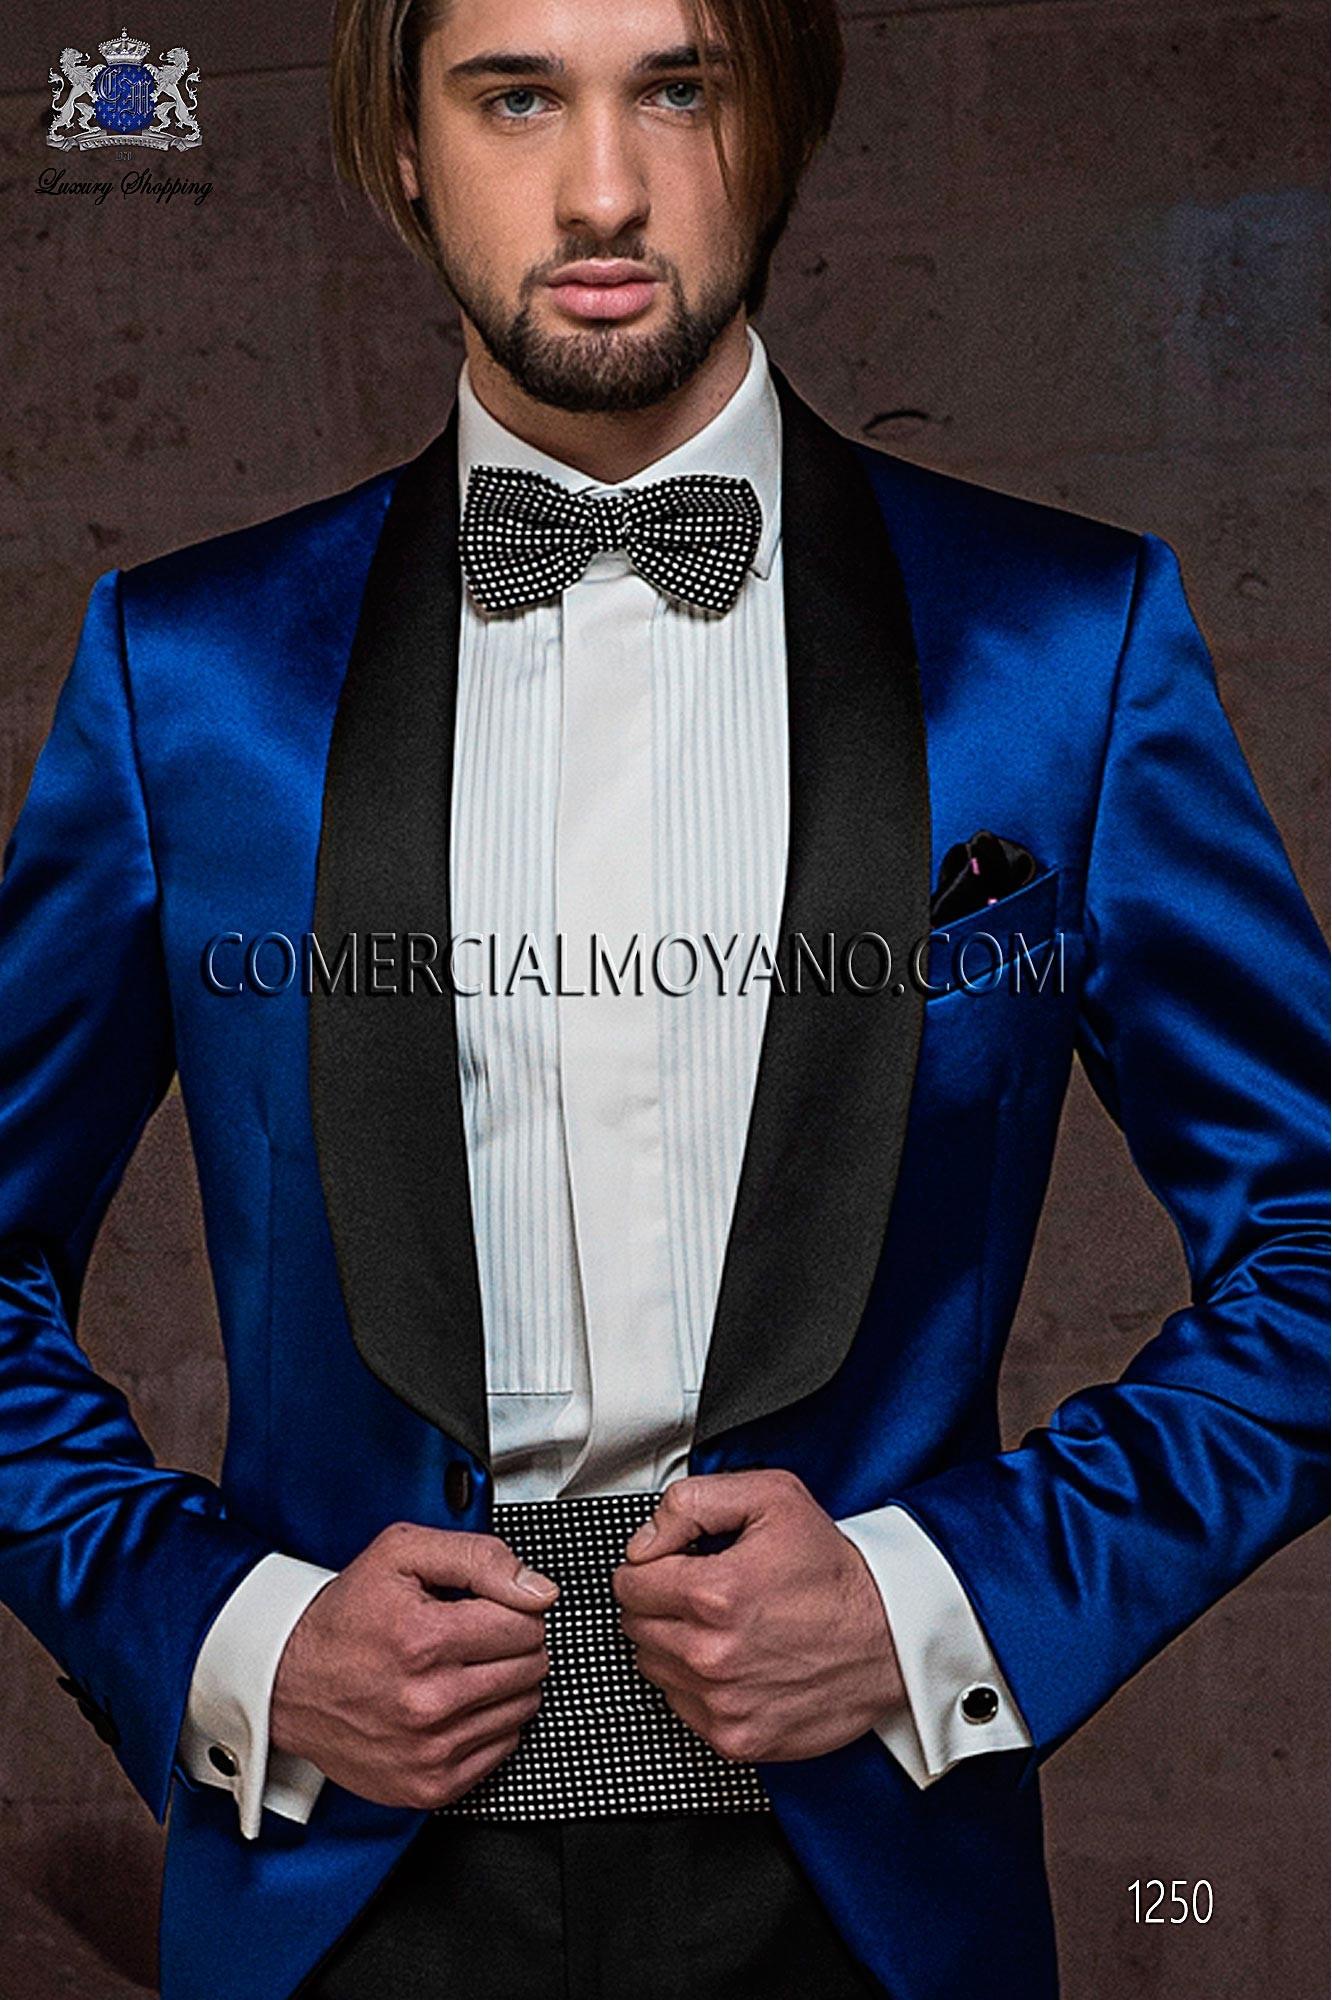 Navy blue silk cummerbund and bow tie with micro design, ONGala.